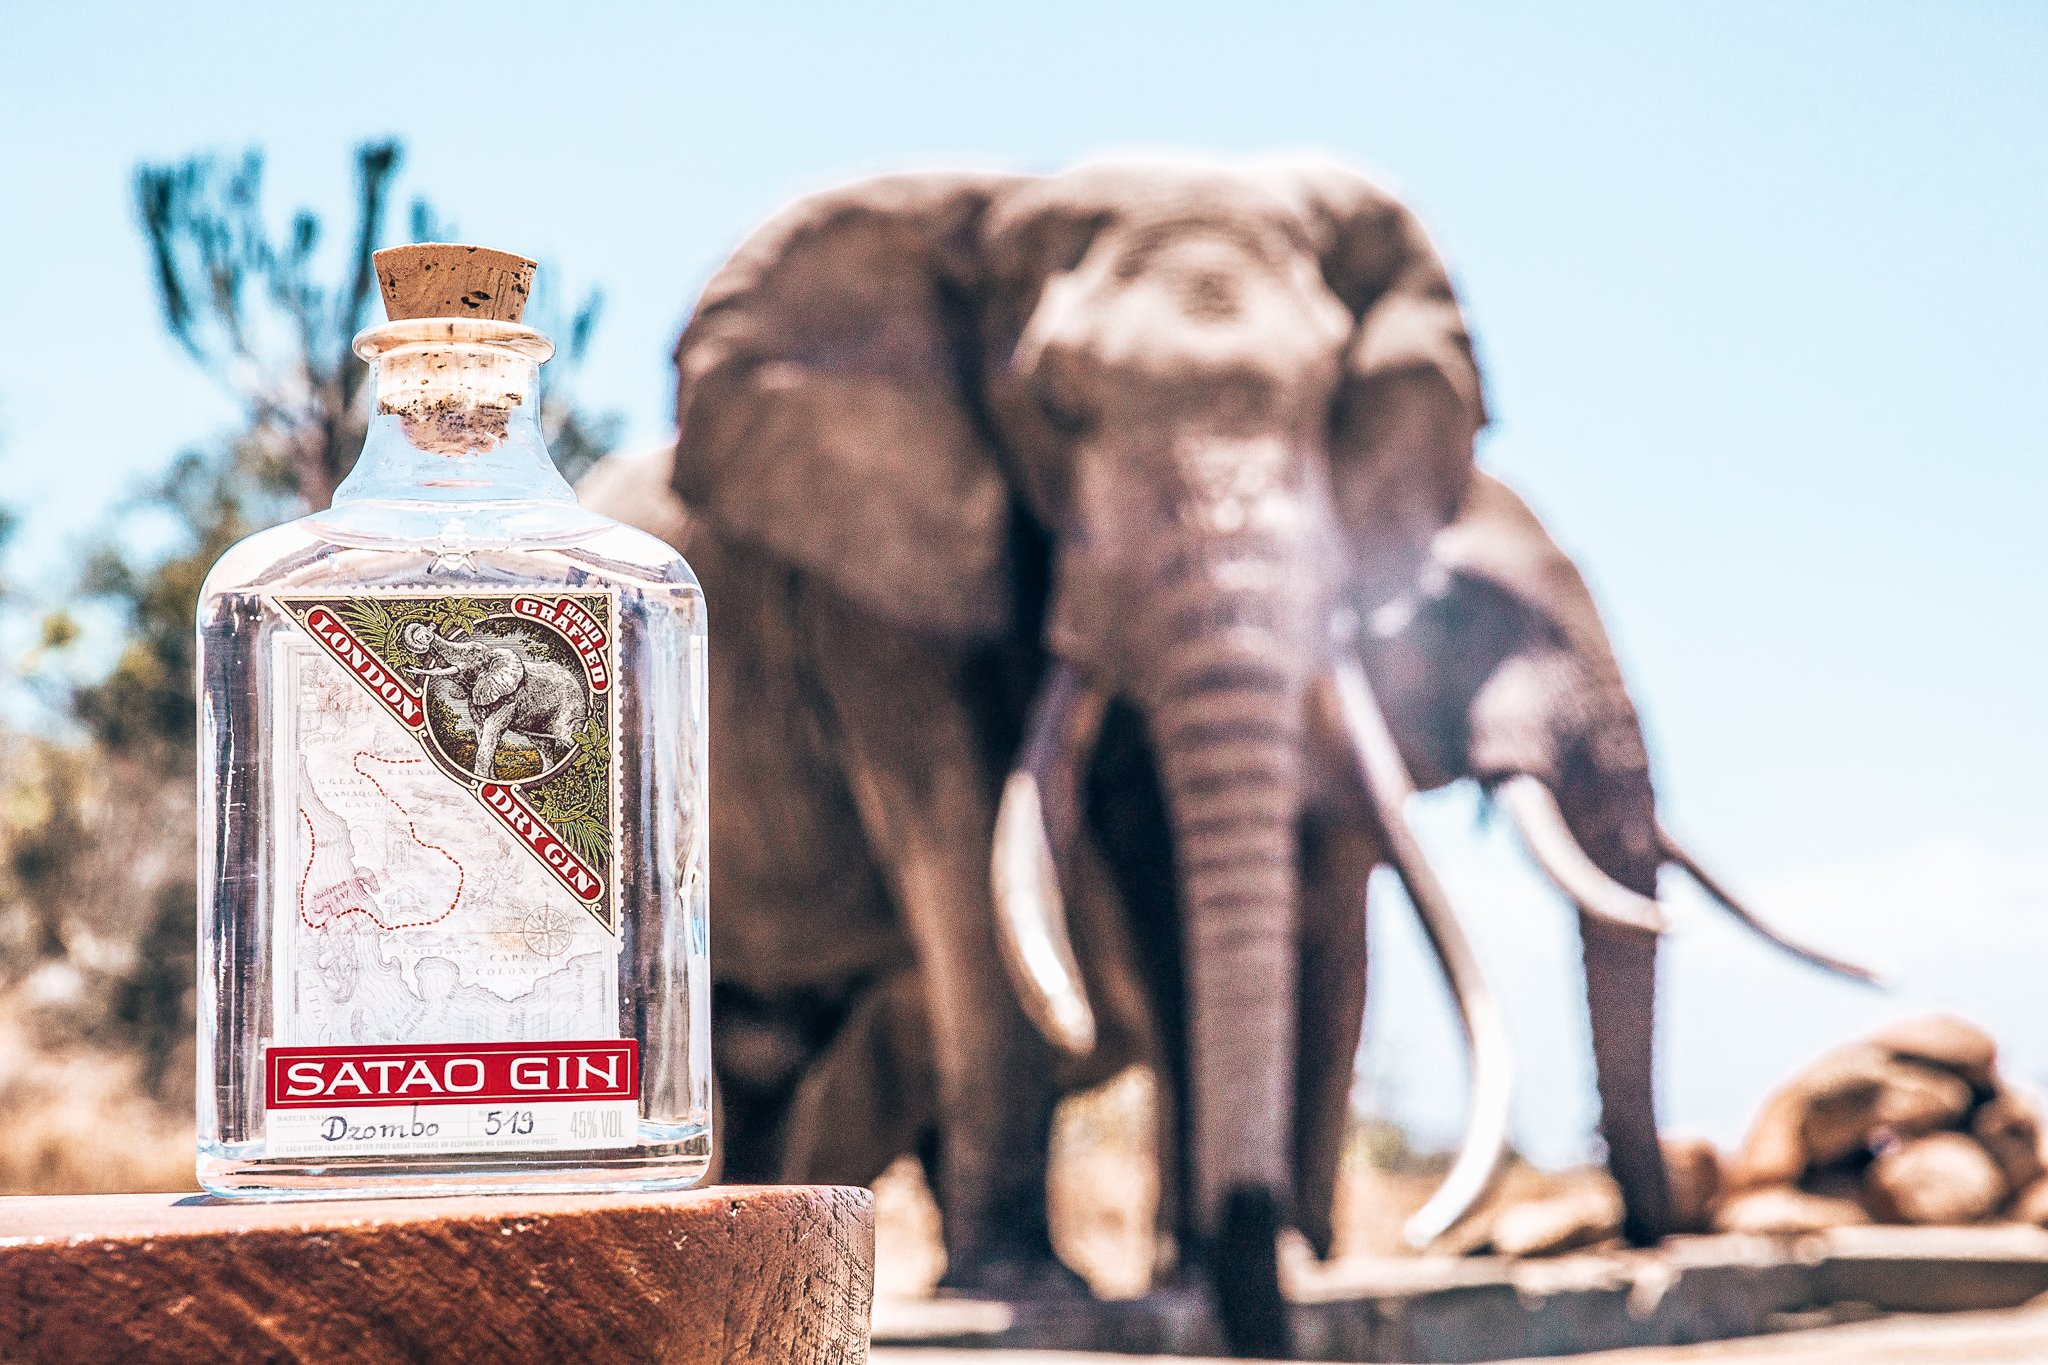 Satao Gin steunt de Afrikaanse olifant, Alles over gin.